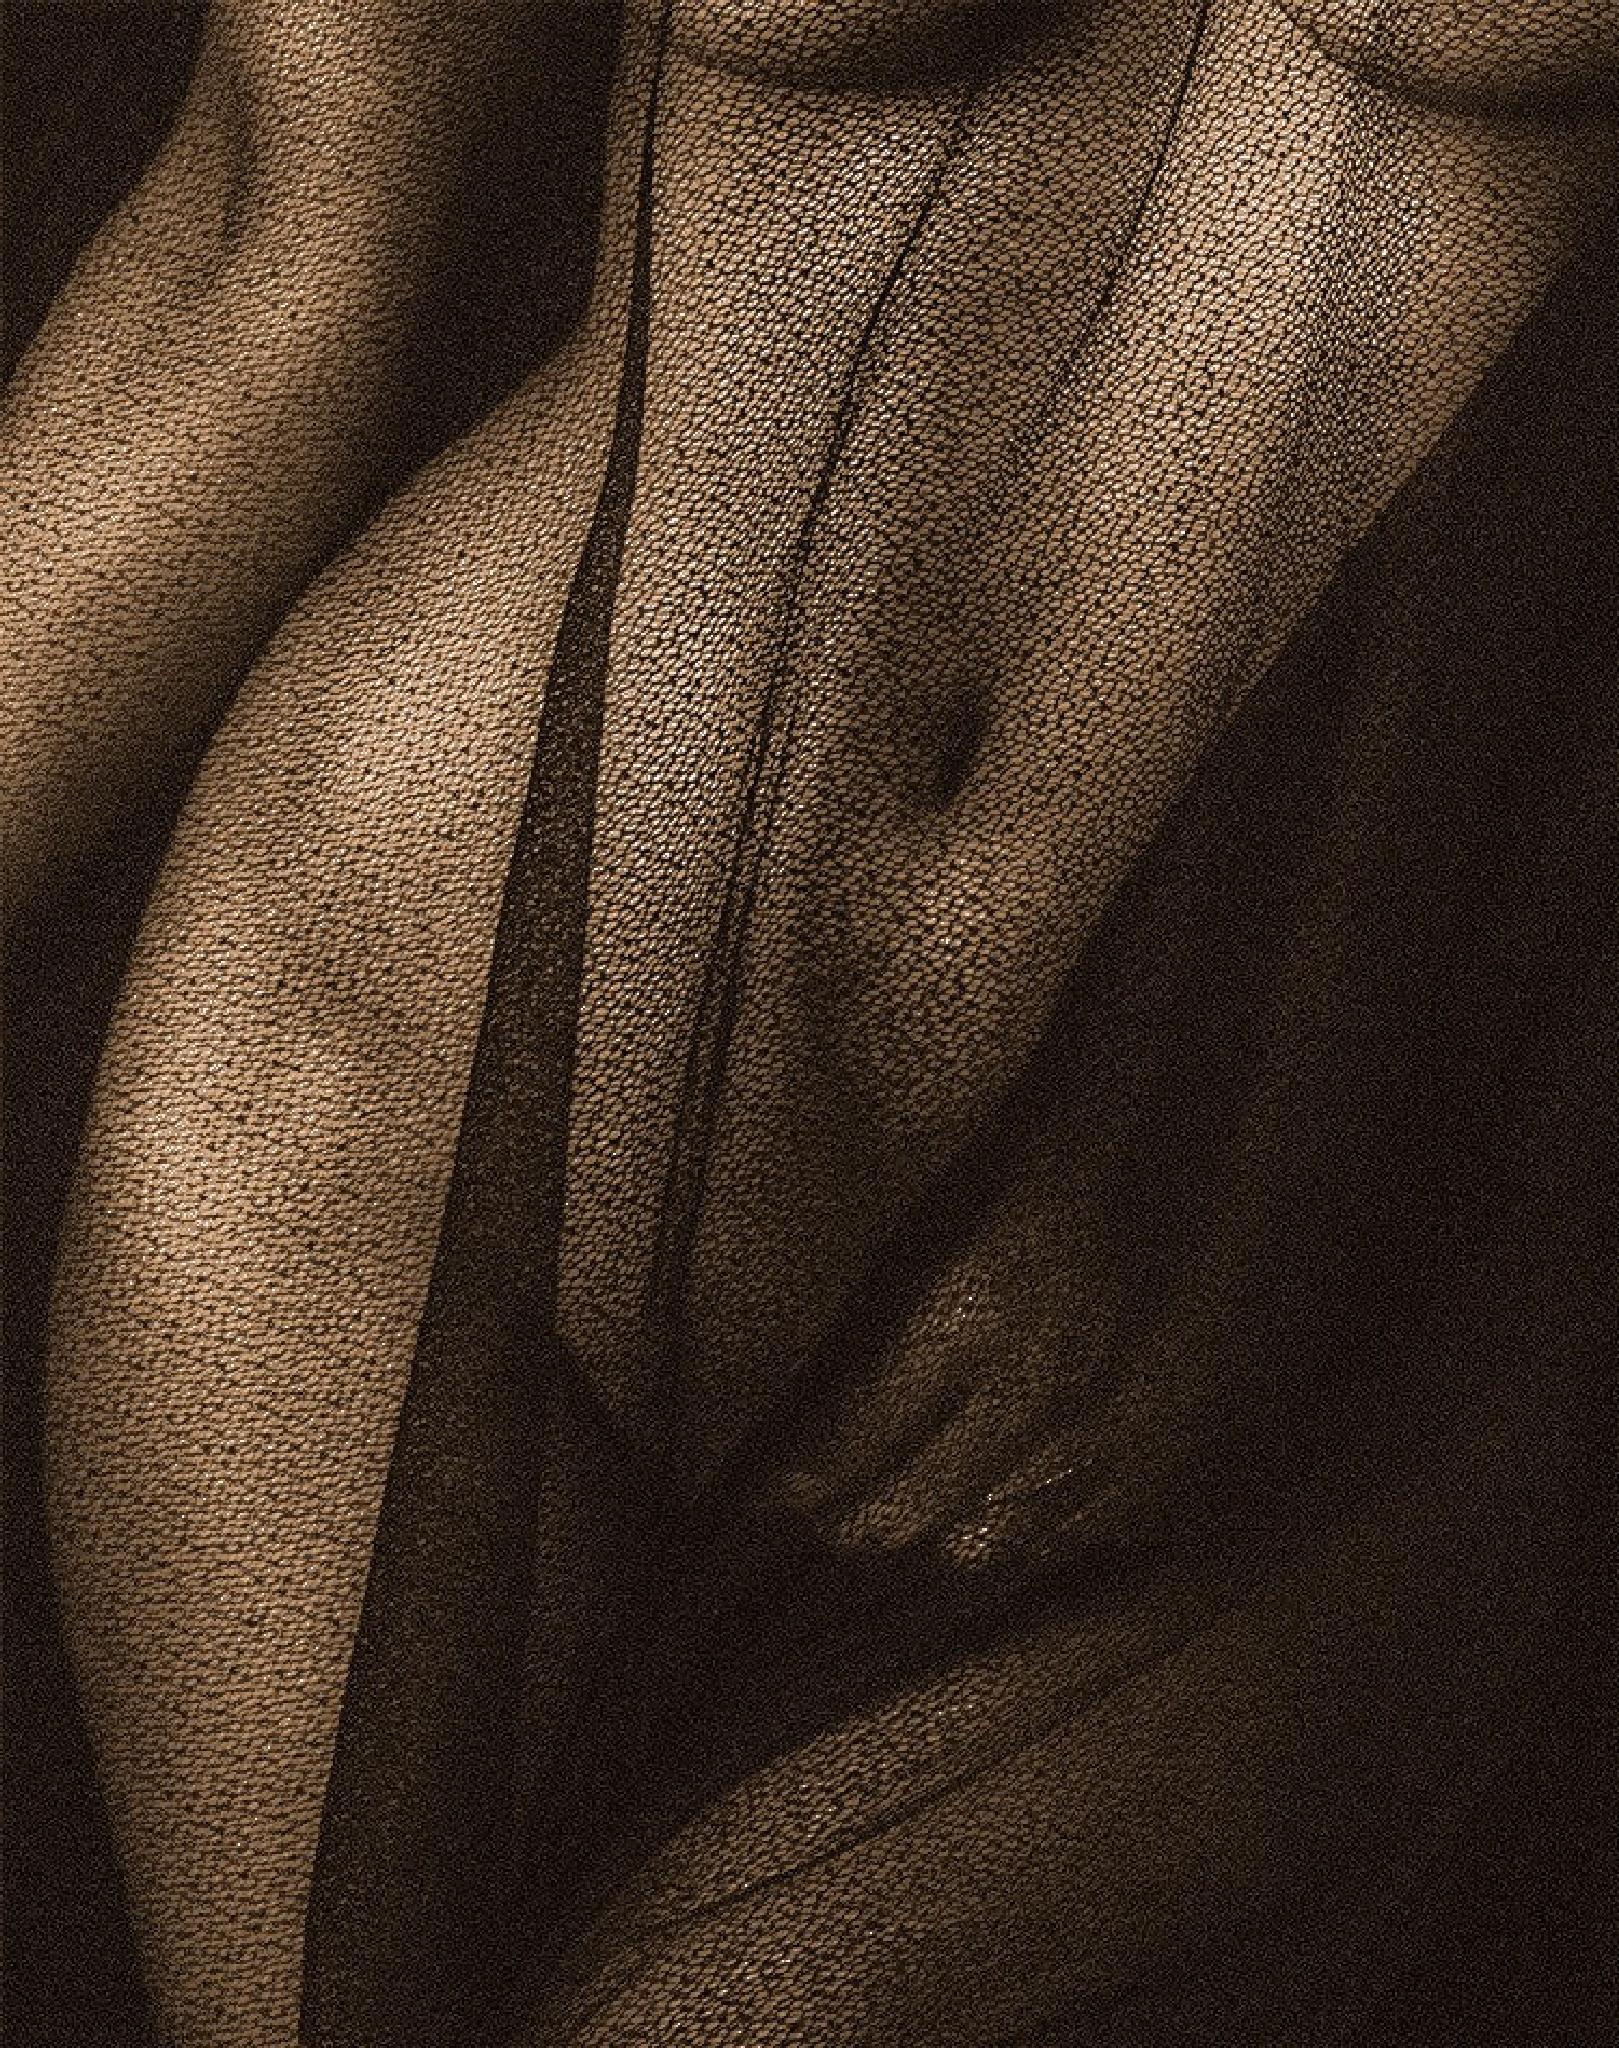 Untitled by Clicks_ravi